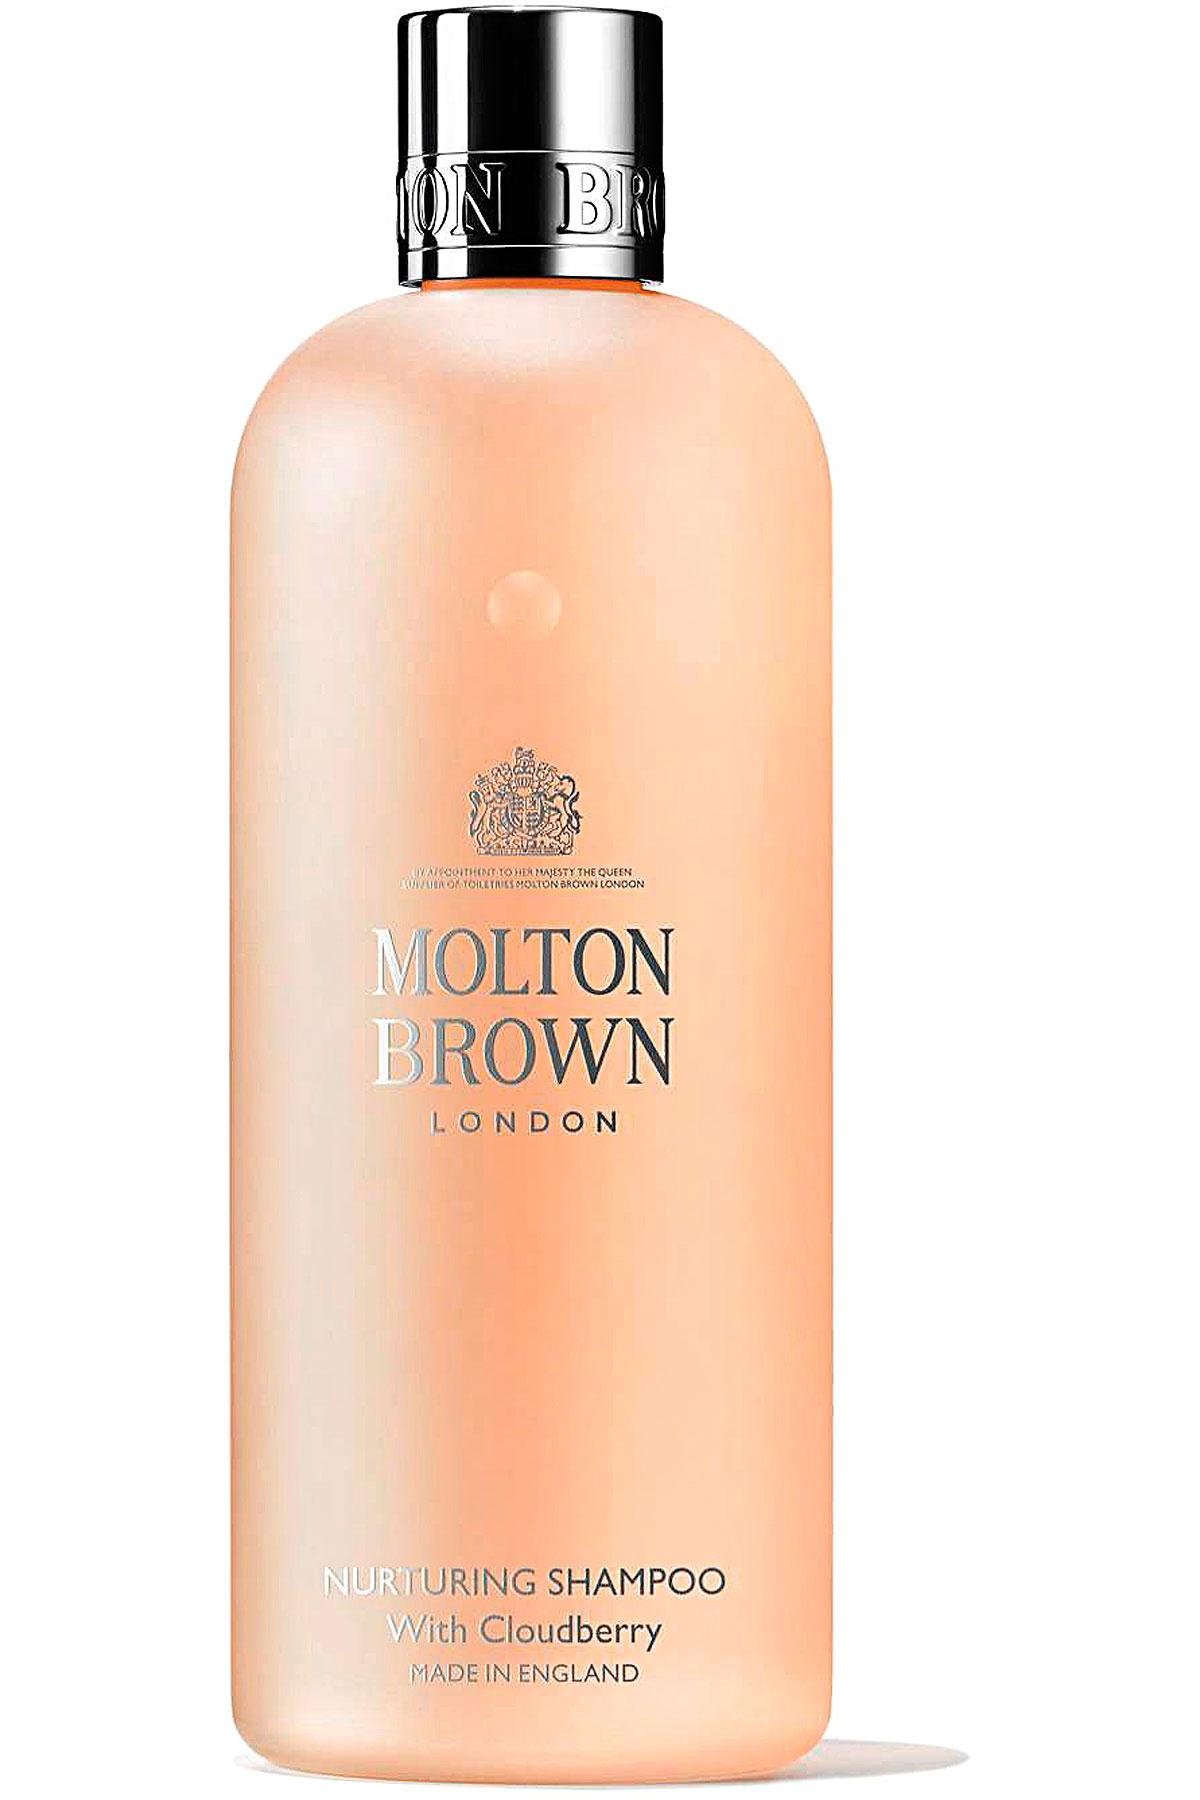 Molton Brown Beauty for Women, Cloudberry - Nurturing Shampoo - 300 Ml, 2019, 300 ml